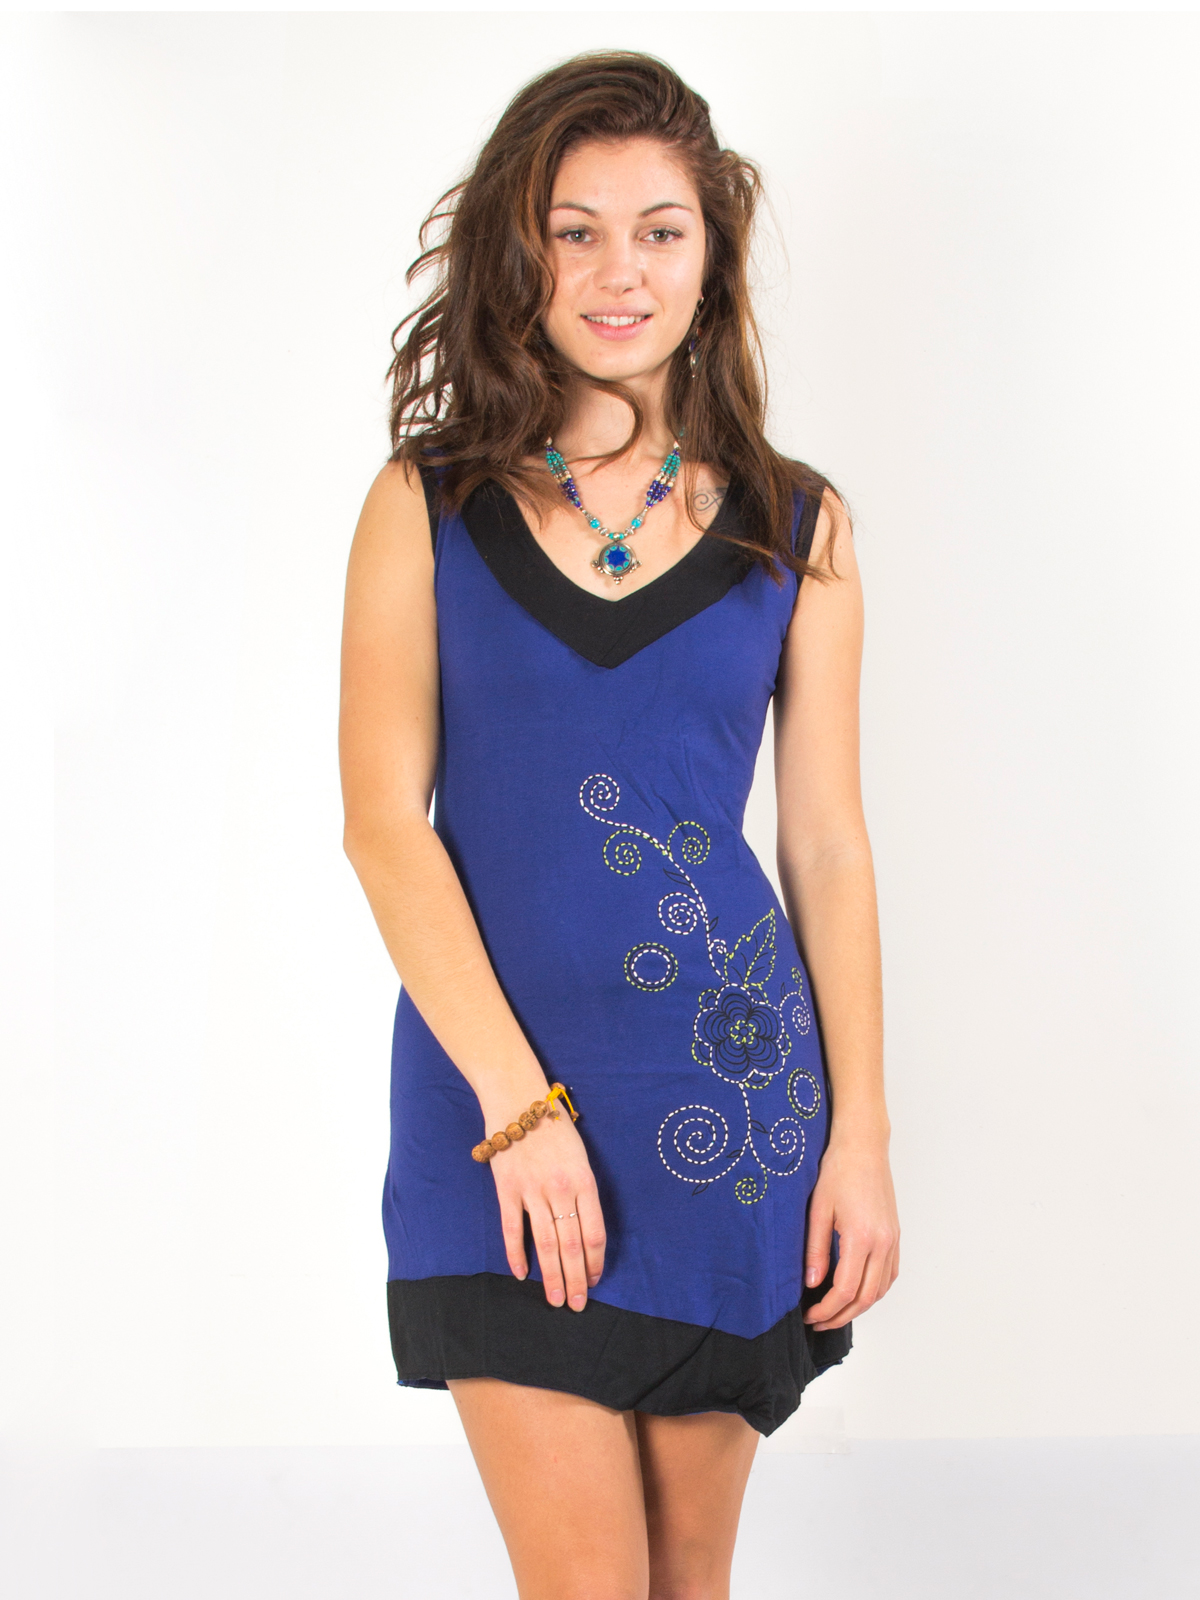 c8dc1bc0a54 Robe bleu coupe elfique broderie fleurie